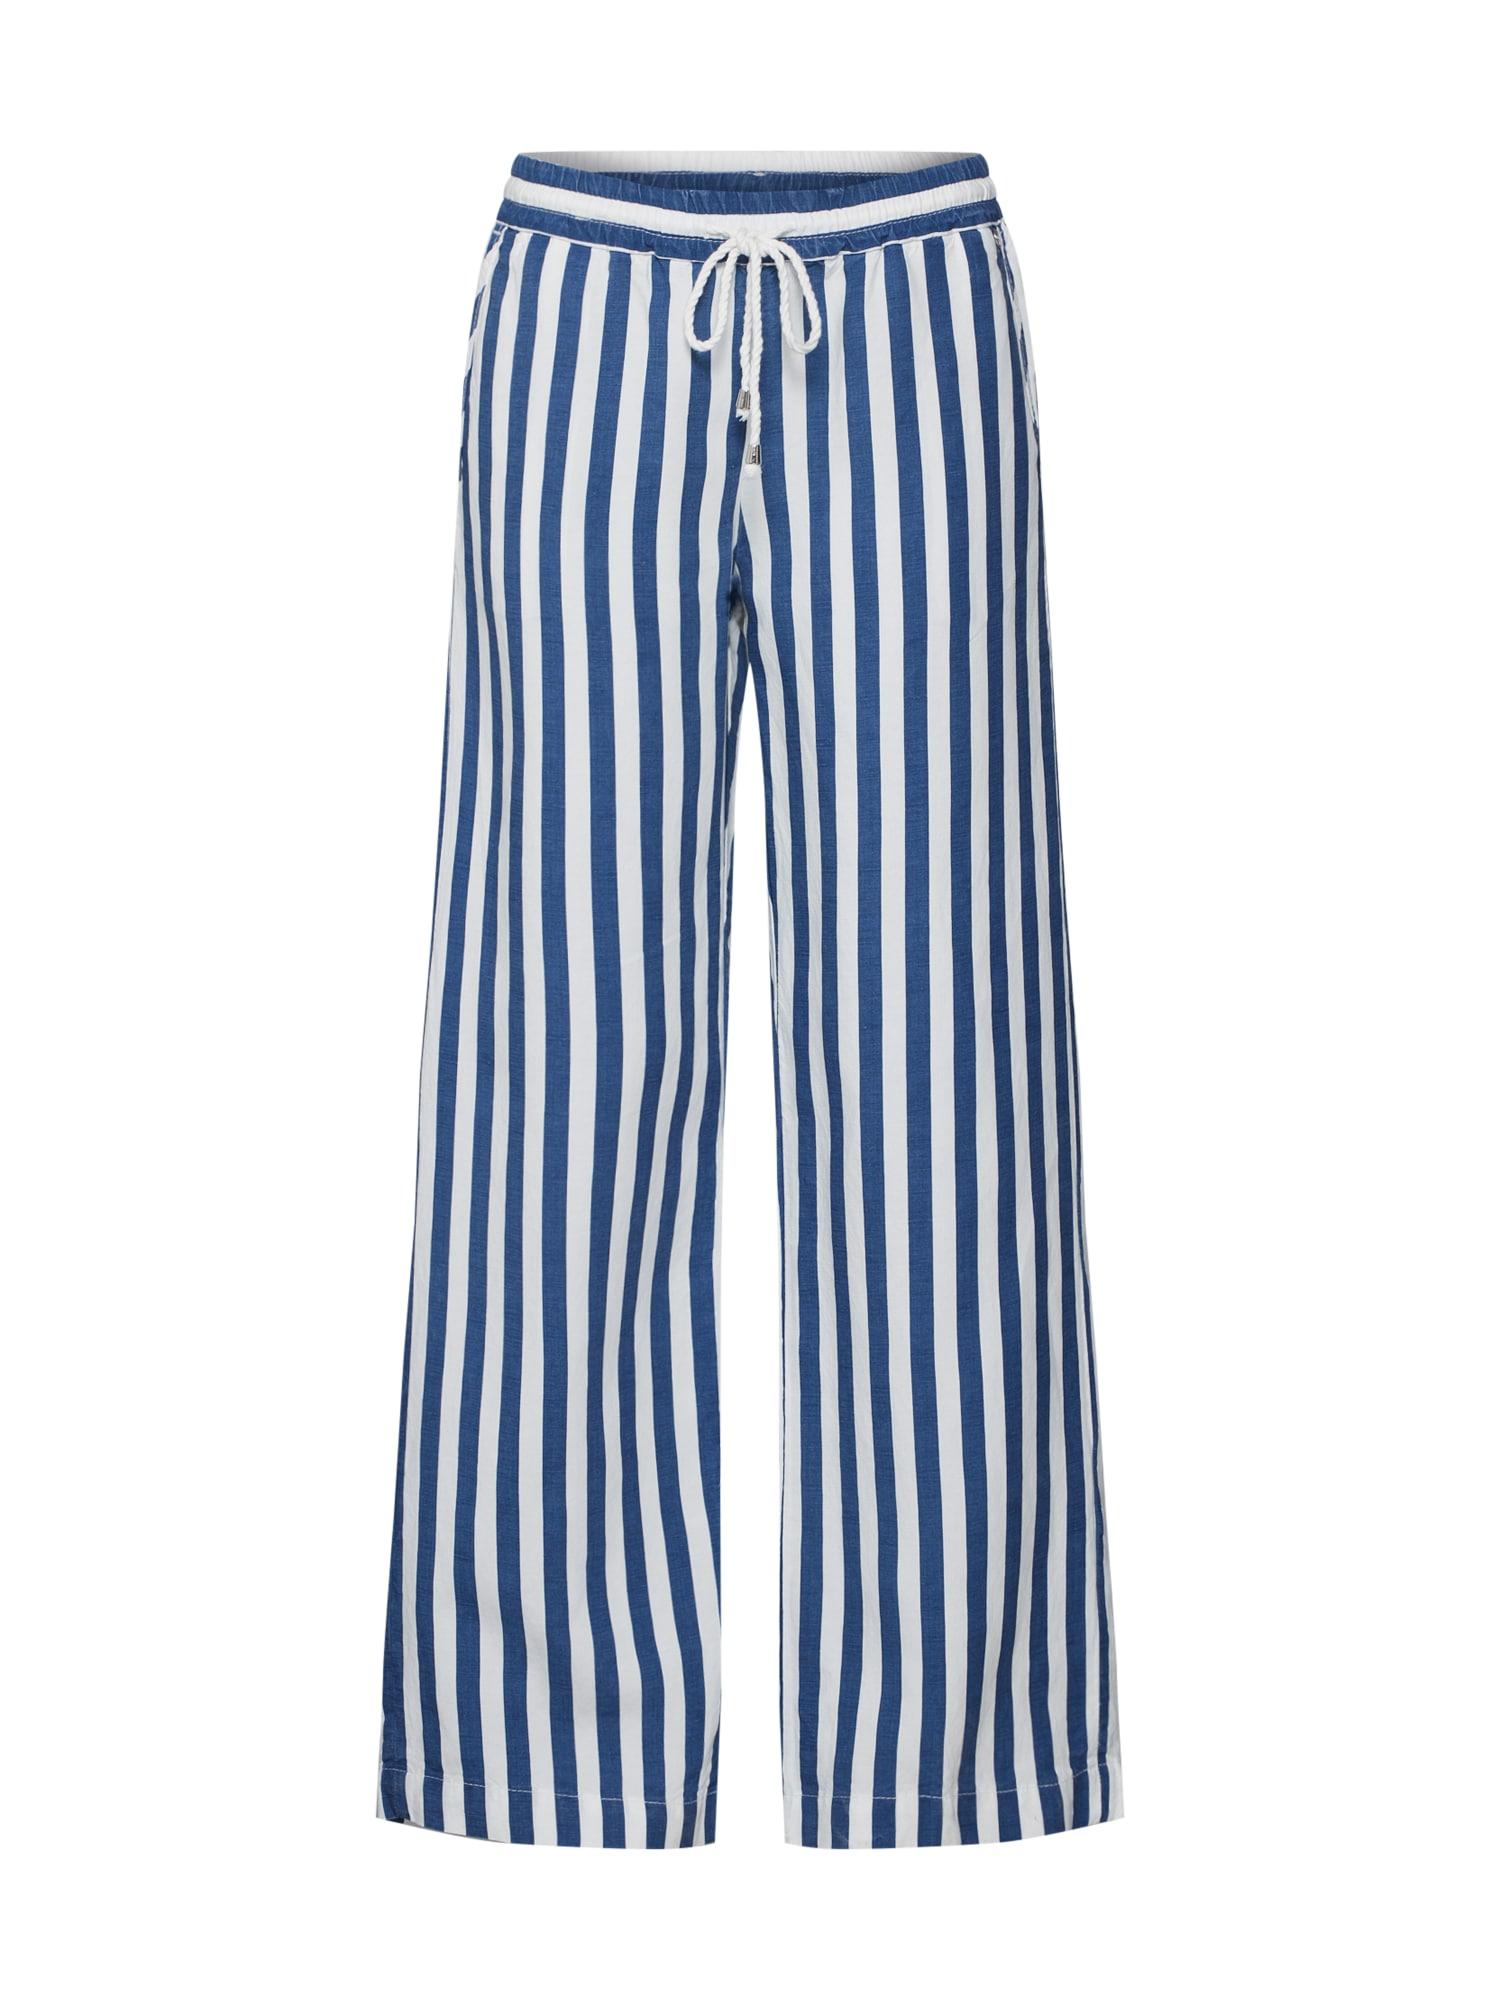 Krojové kalhoty modrá bílá Rich & Royal